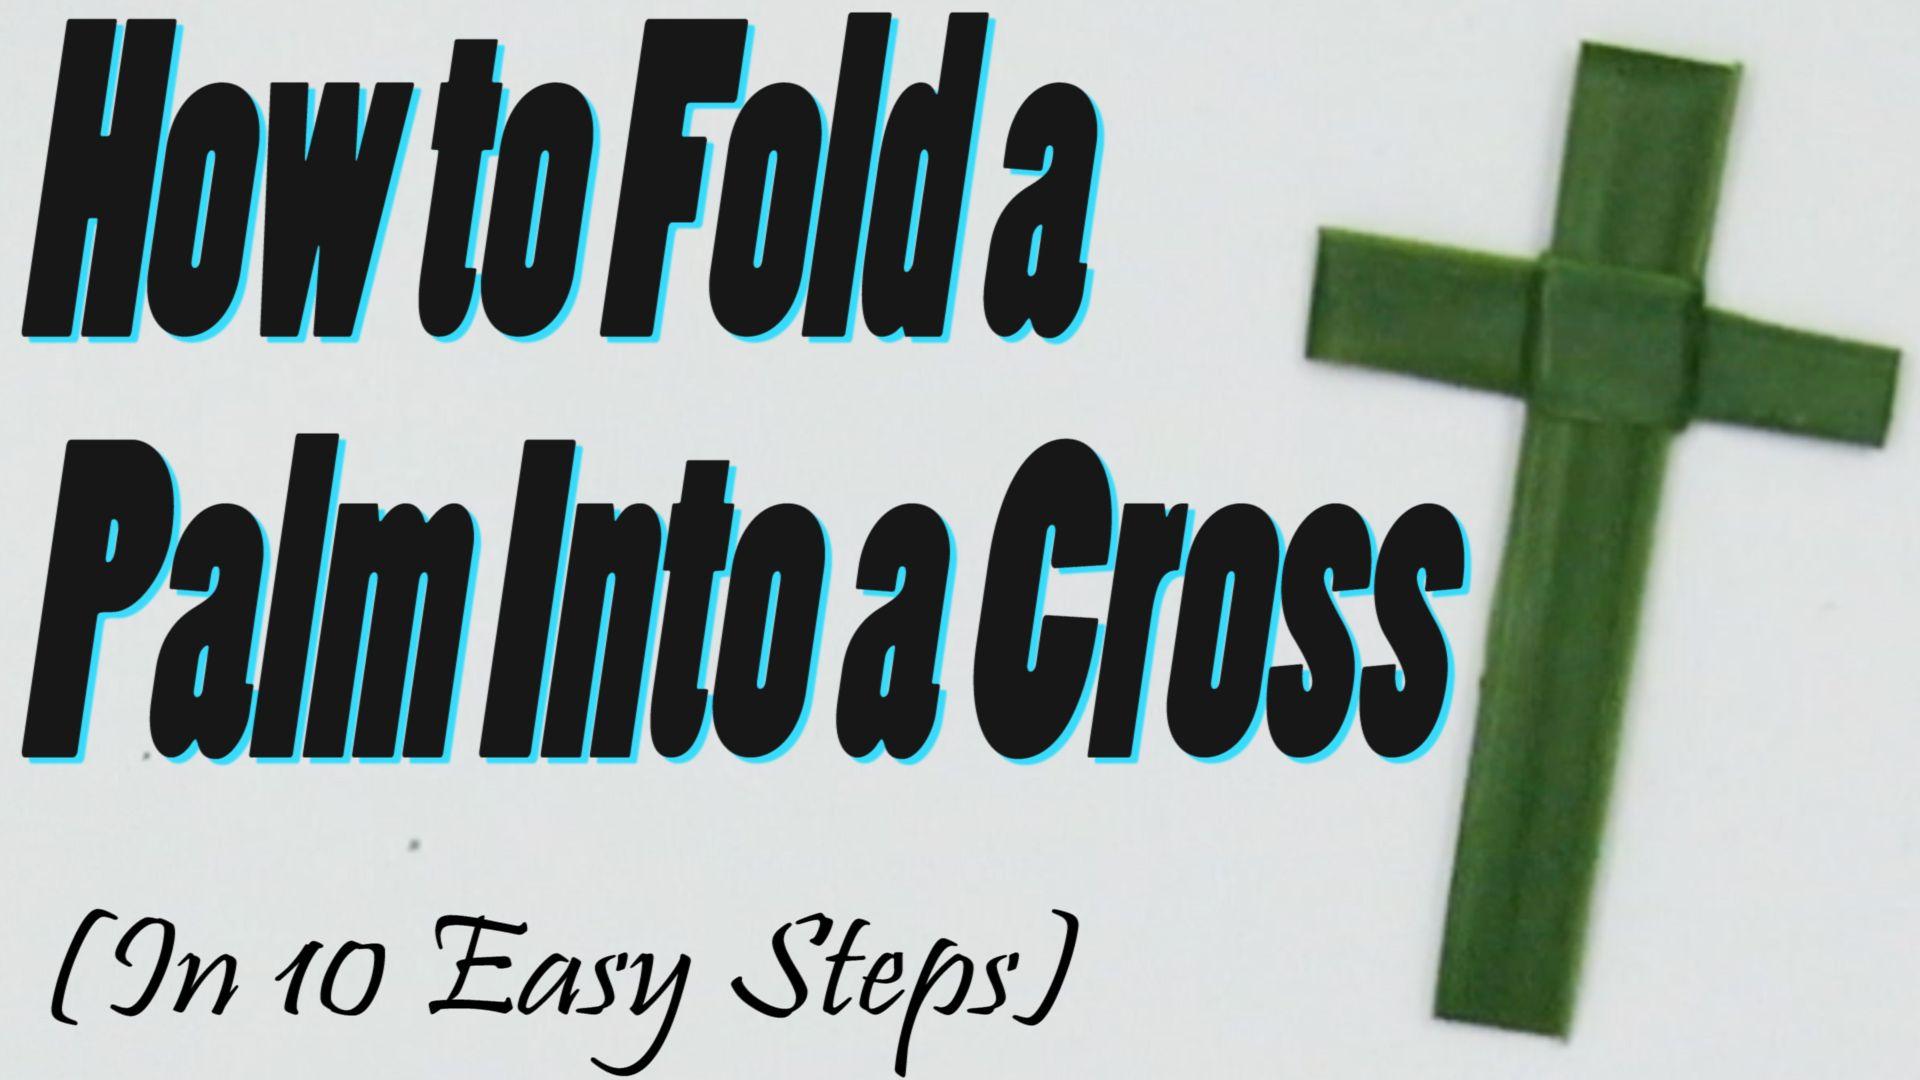 Hey maaa palm cross palm sunday crafts diy tutorial